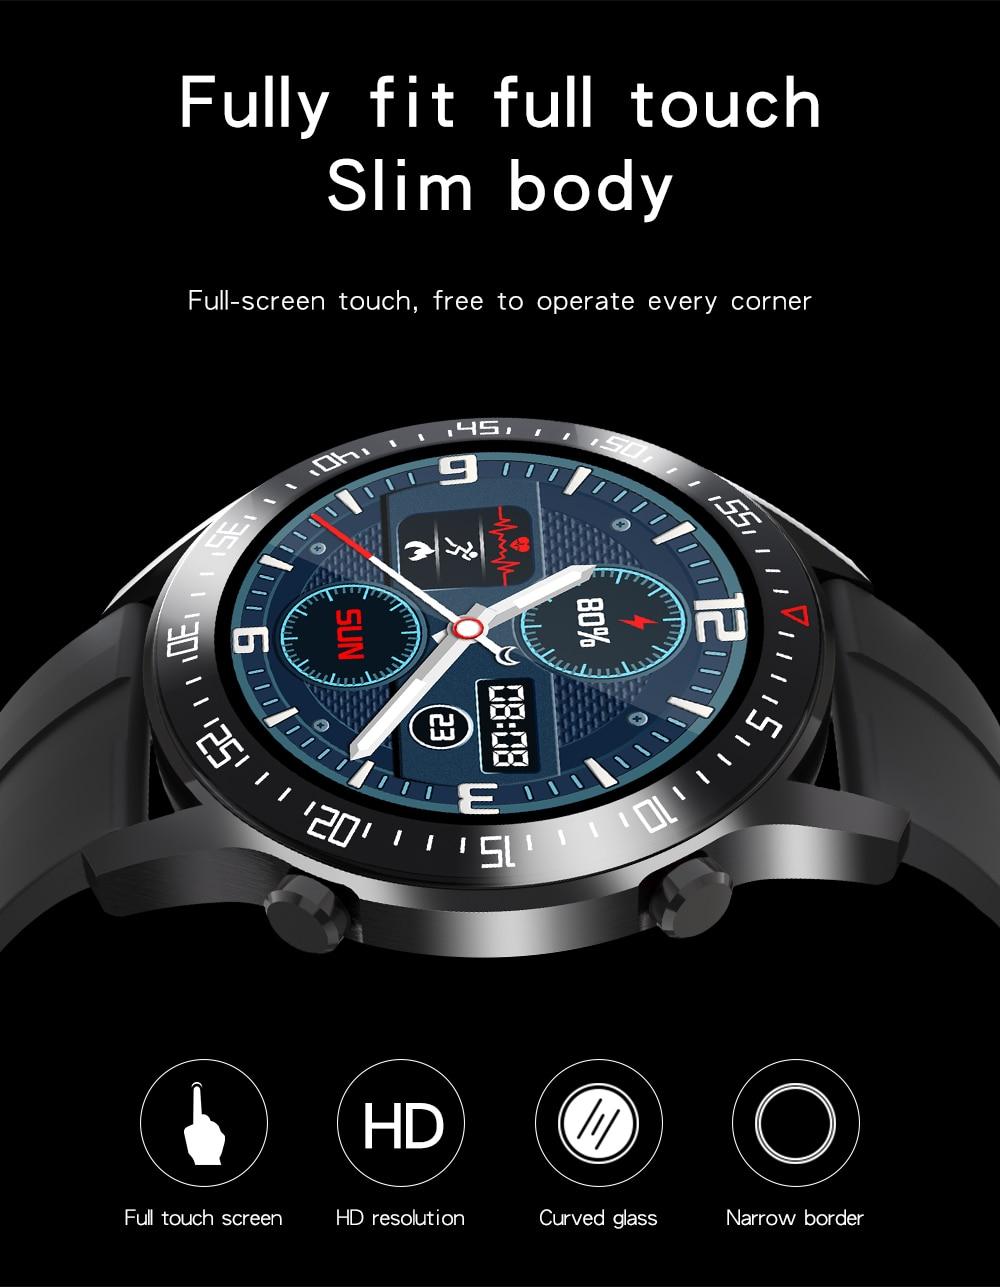 Hb865b00152e243e384208c635a41e8ceV XUESEVEN 2021 HD Full circle touch screen Mens Smart Watches IP68 Waterproof Sports Fitness Watch Fashion Smart Watch for men